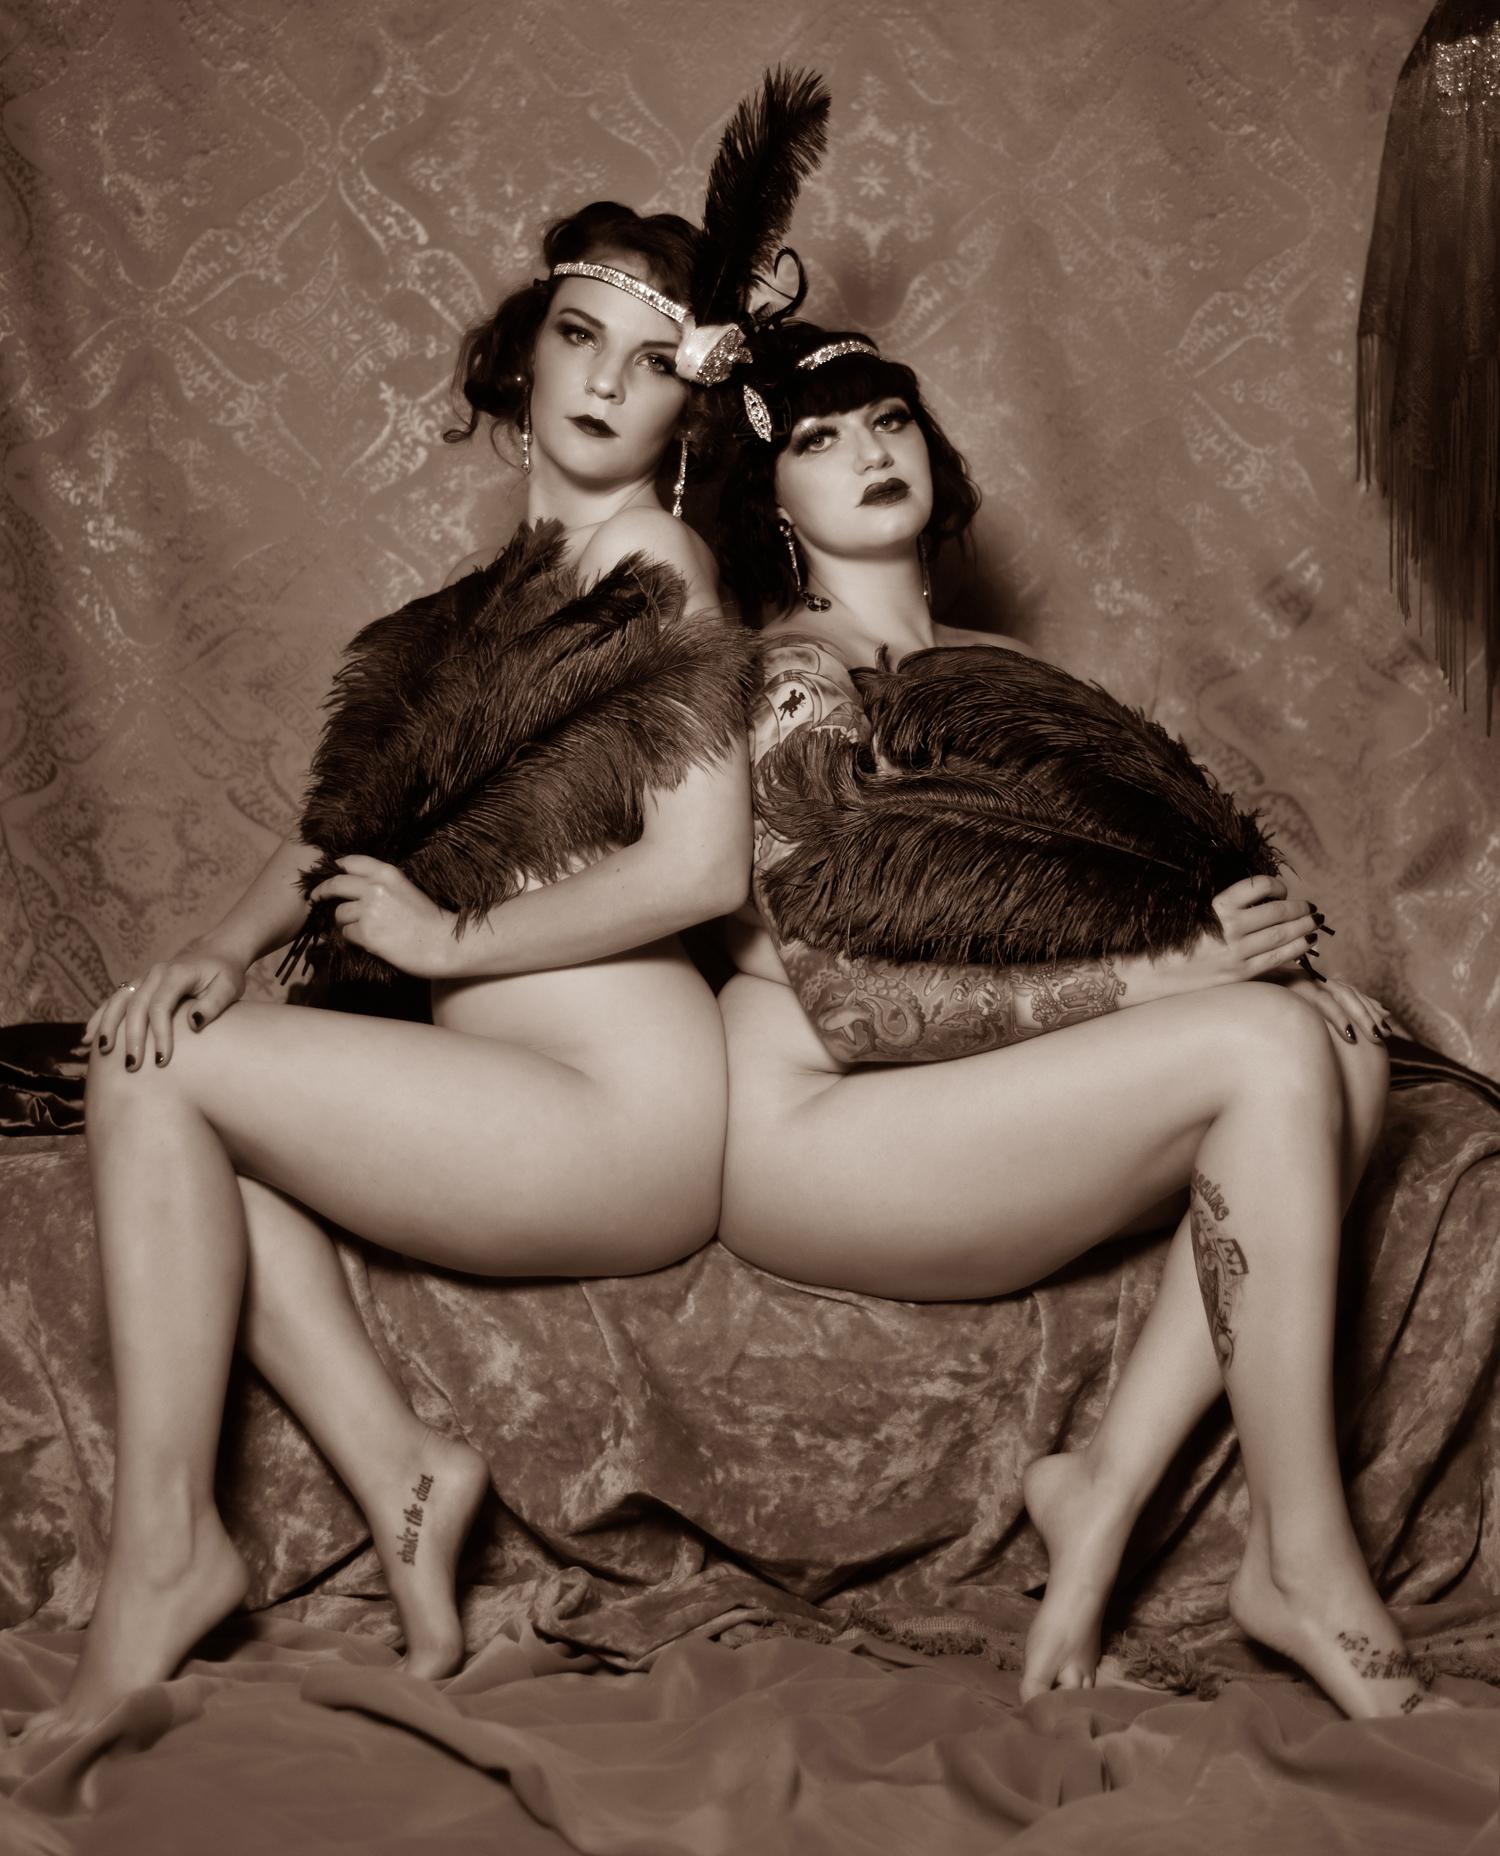 Vintage Photographer Denver 1920s Style by La Photographie 05.jpg